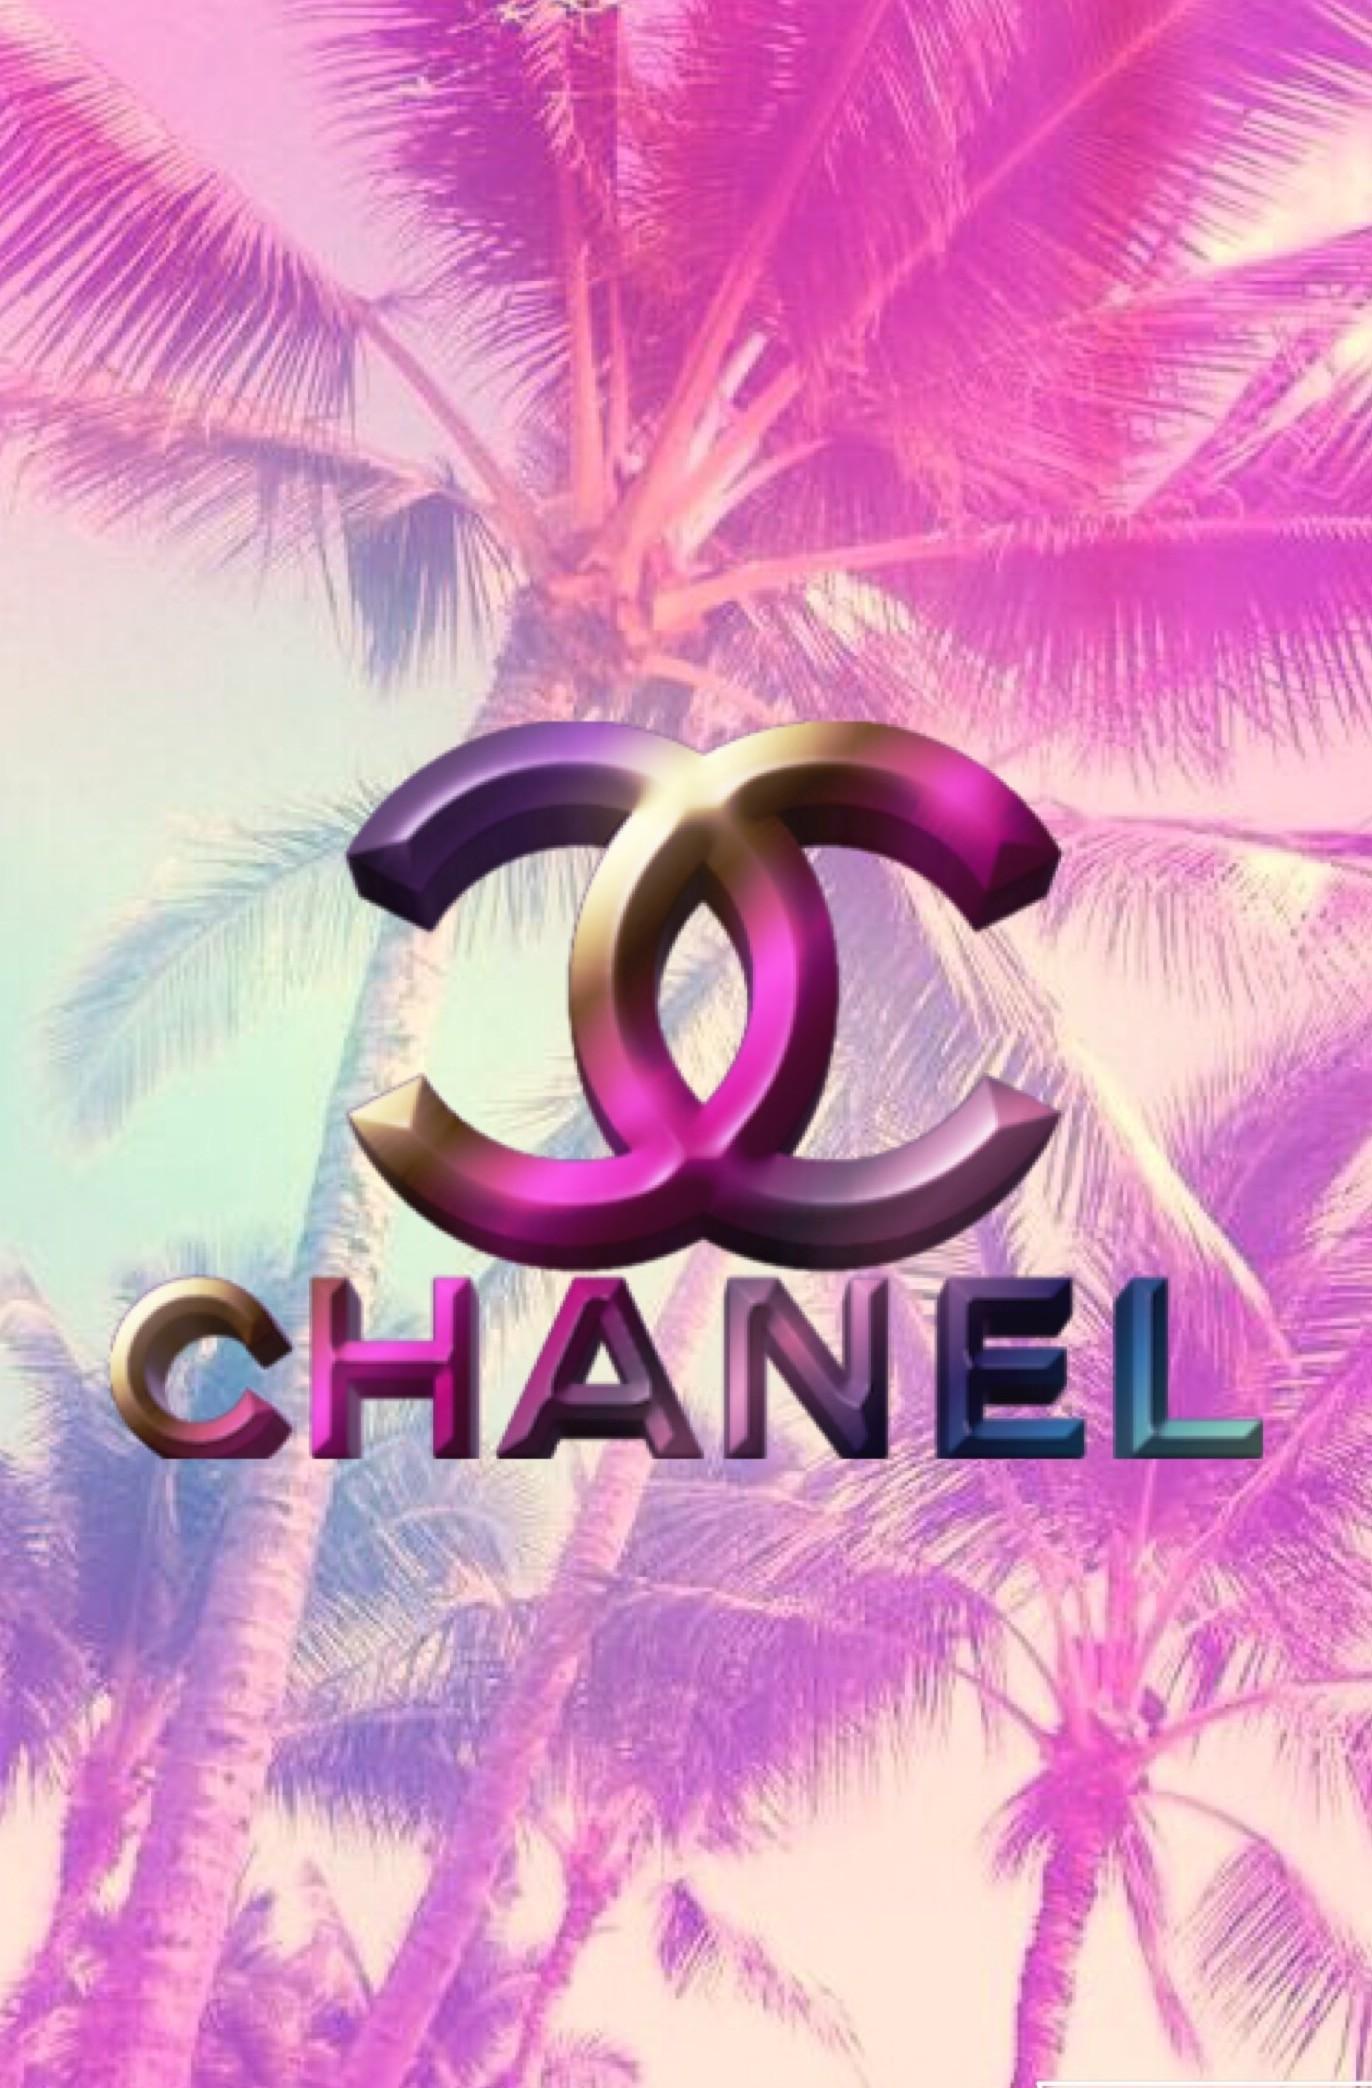 Create by me brand lockscreen chanel